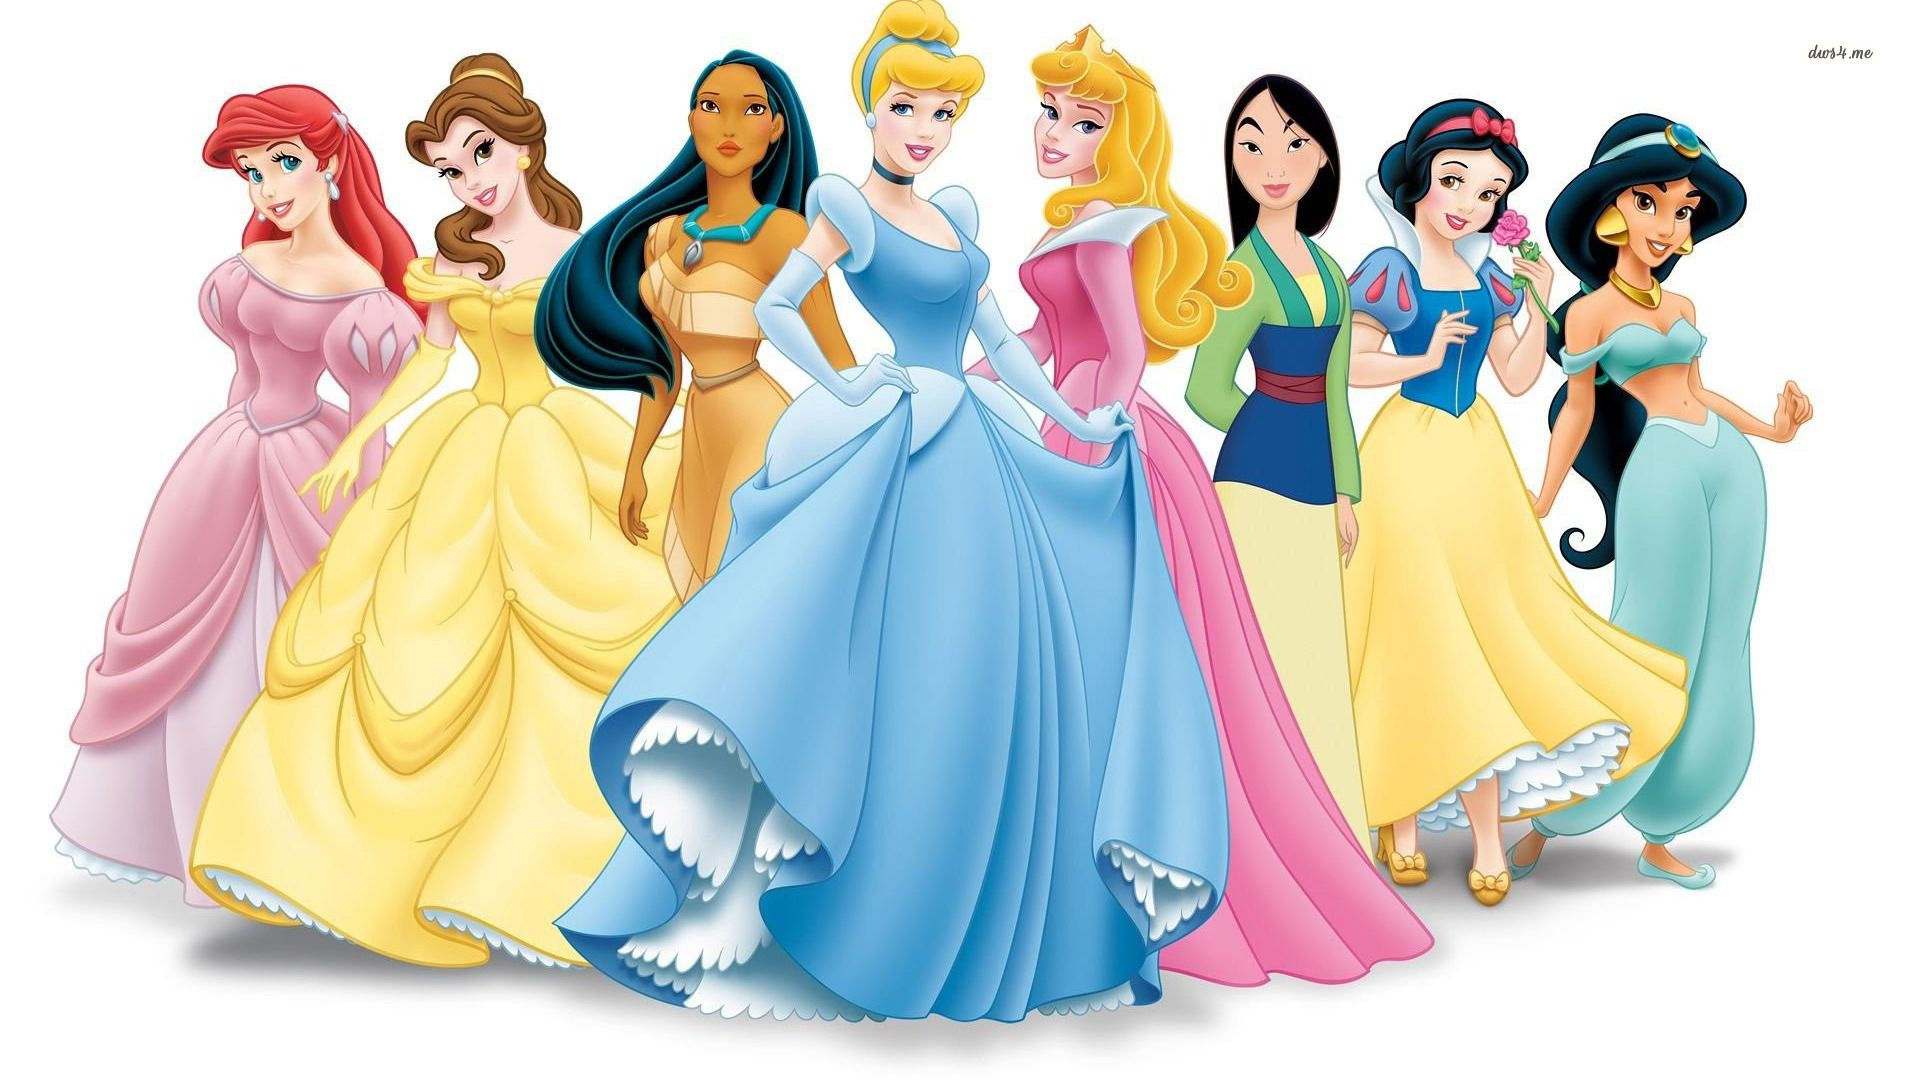 Disney Princesses Hd Wallpaper Disney Princess Wallpaper Disney Princess Movies Princess Movies